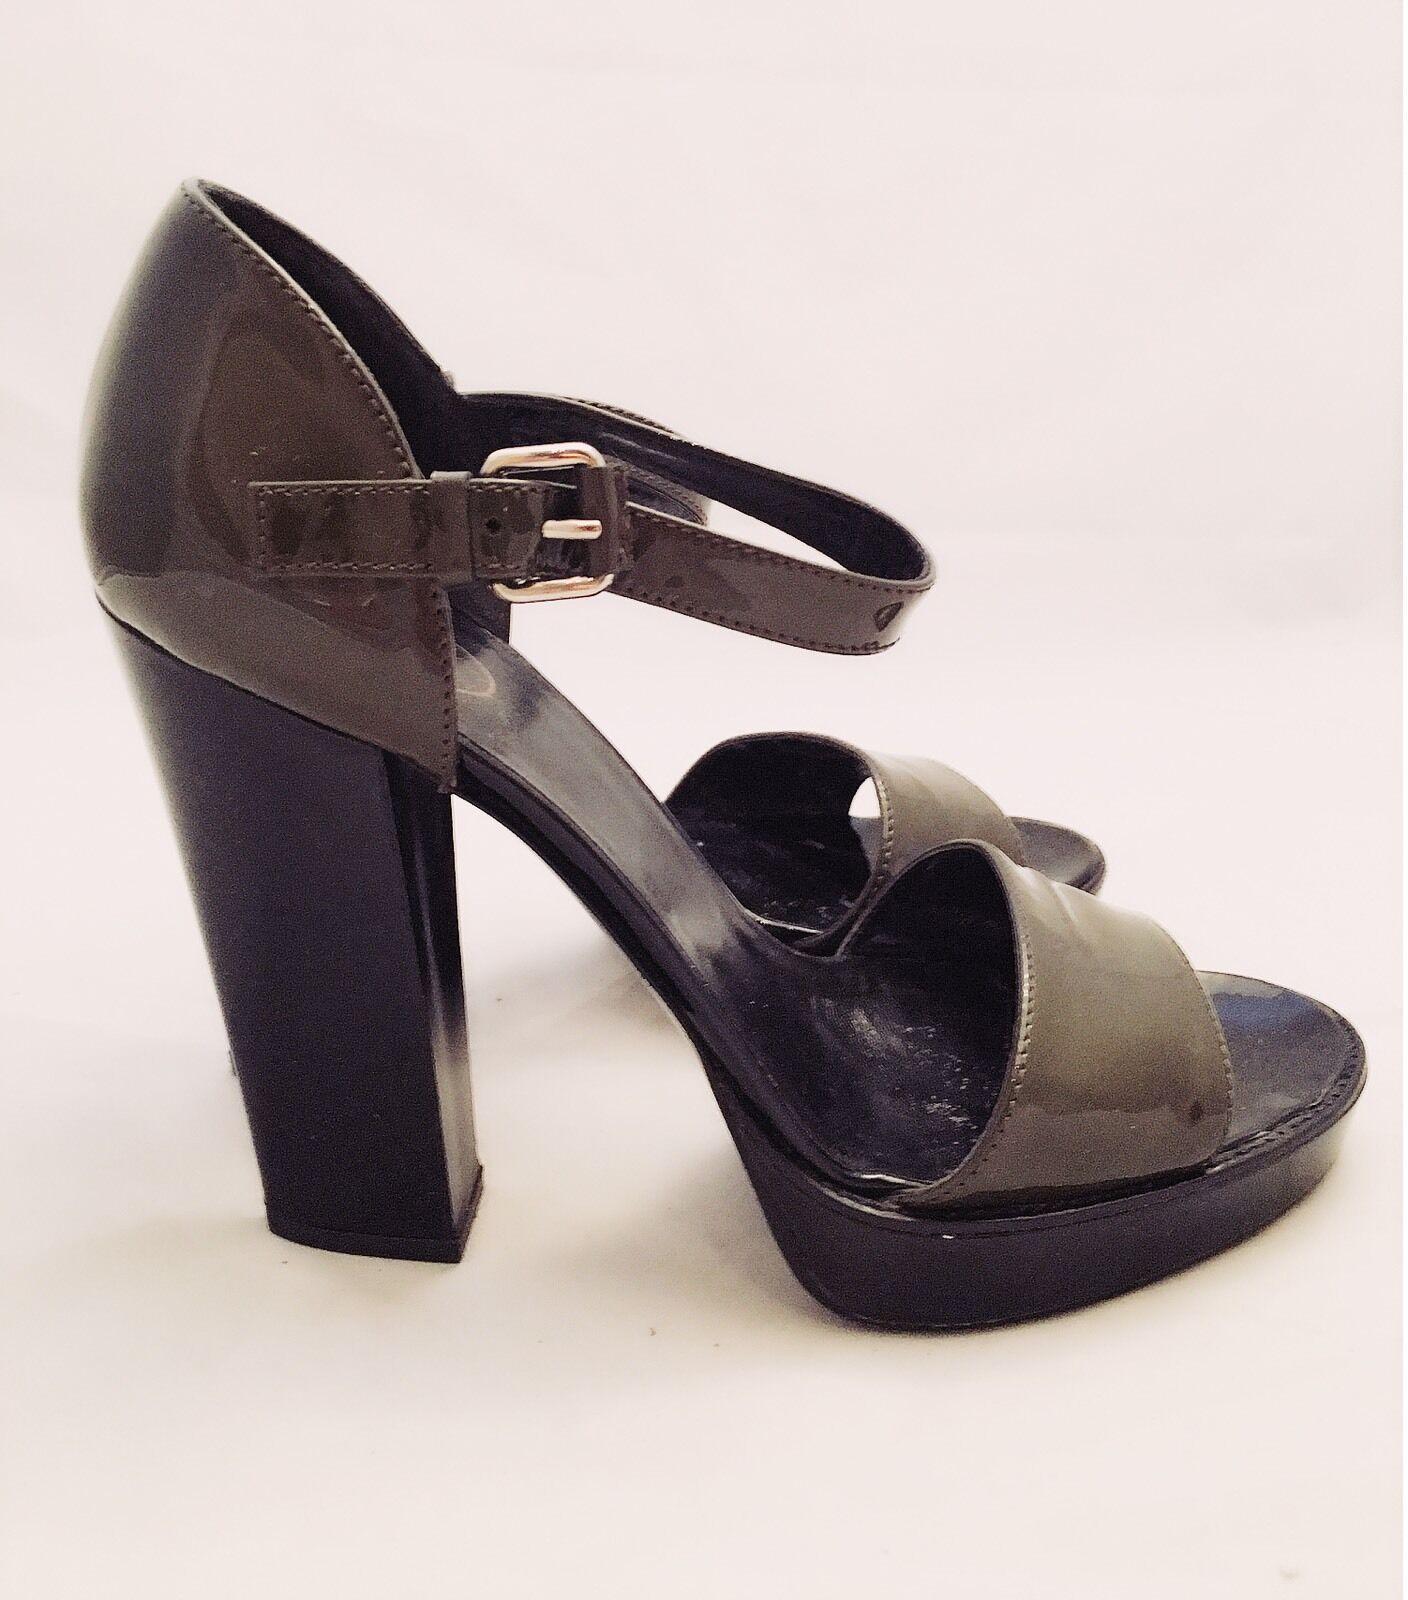 Donna PRADA Dark Khaki Green 9.5 Patent Pelle Platform Heel Strappy Pumps 9.5 Green fc3a9e